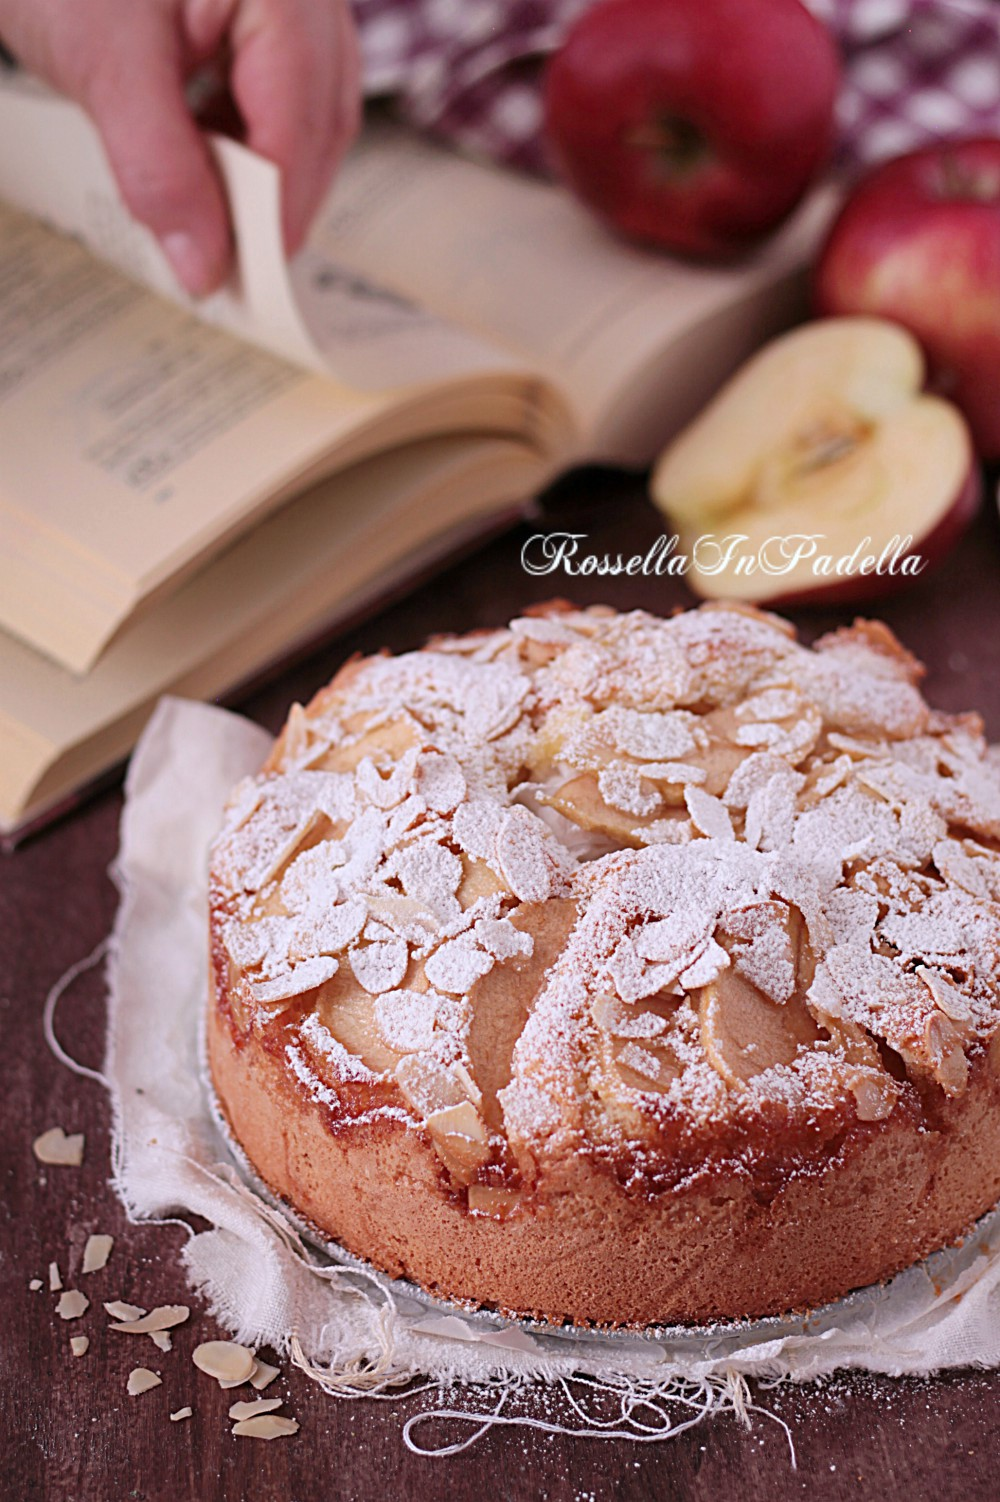 Torta di mele e mandorle, soffice soffice